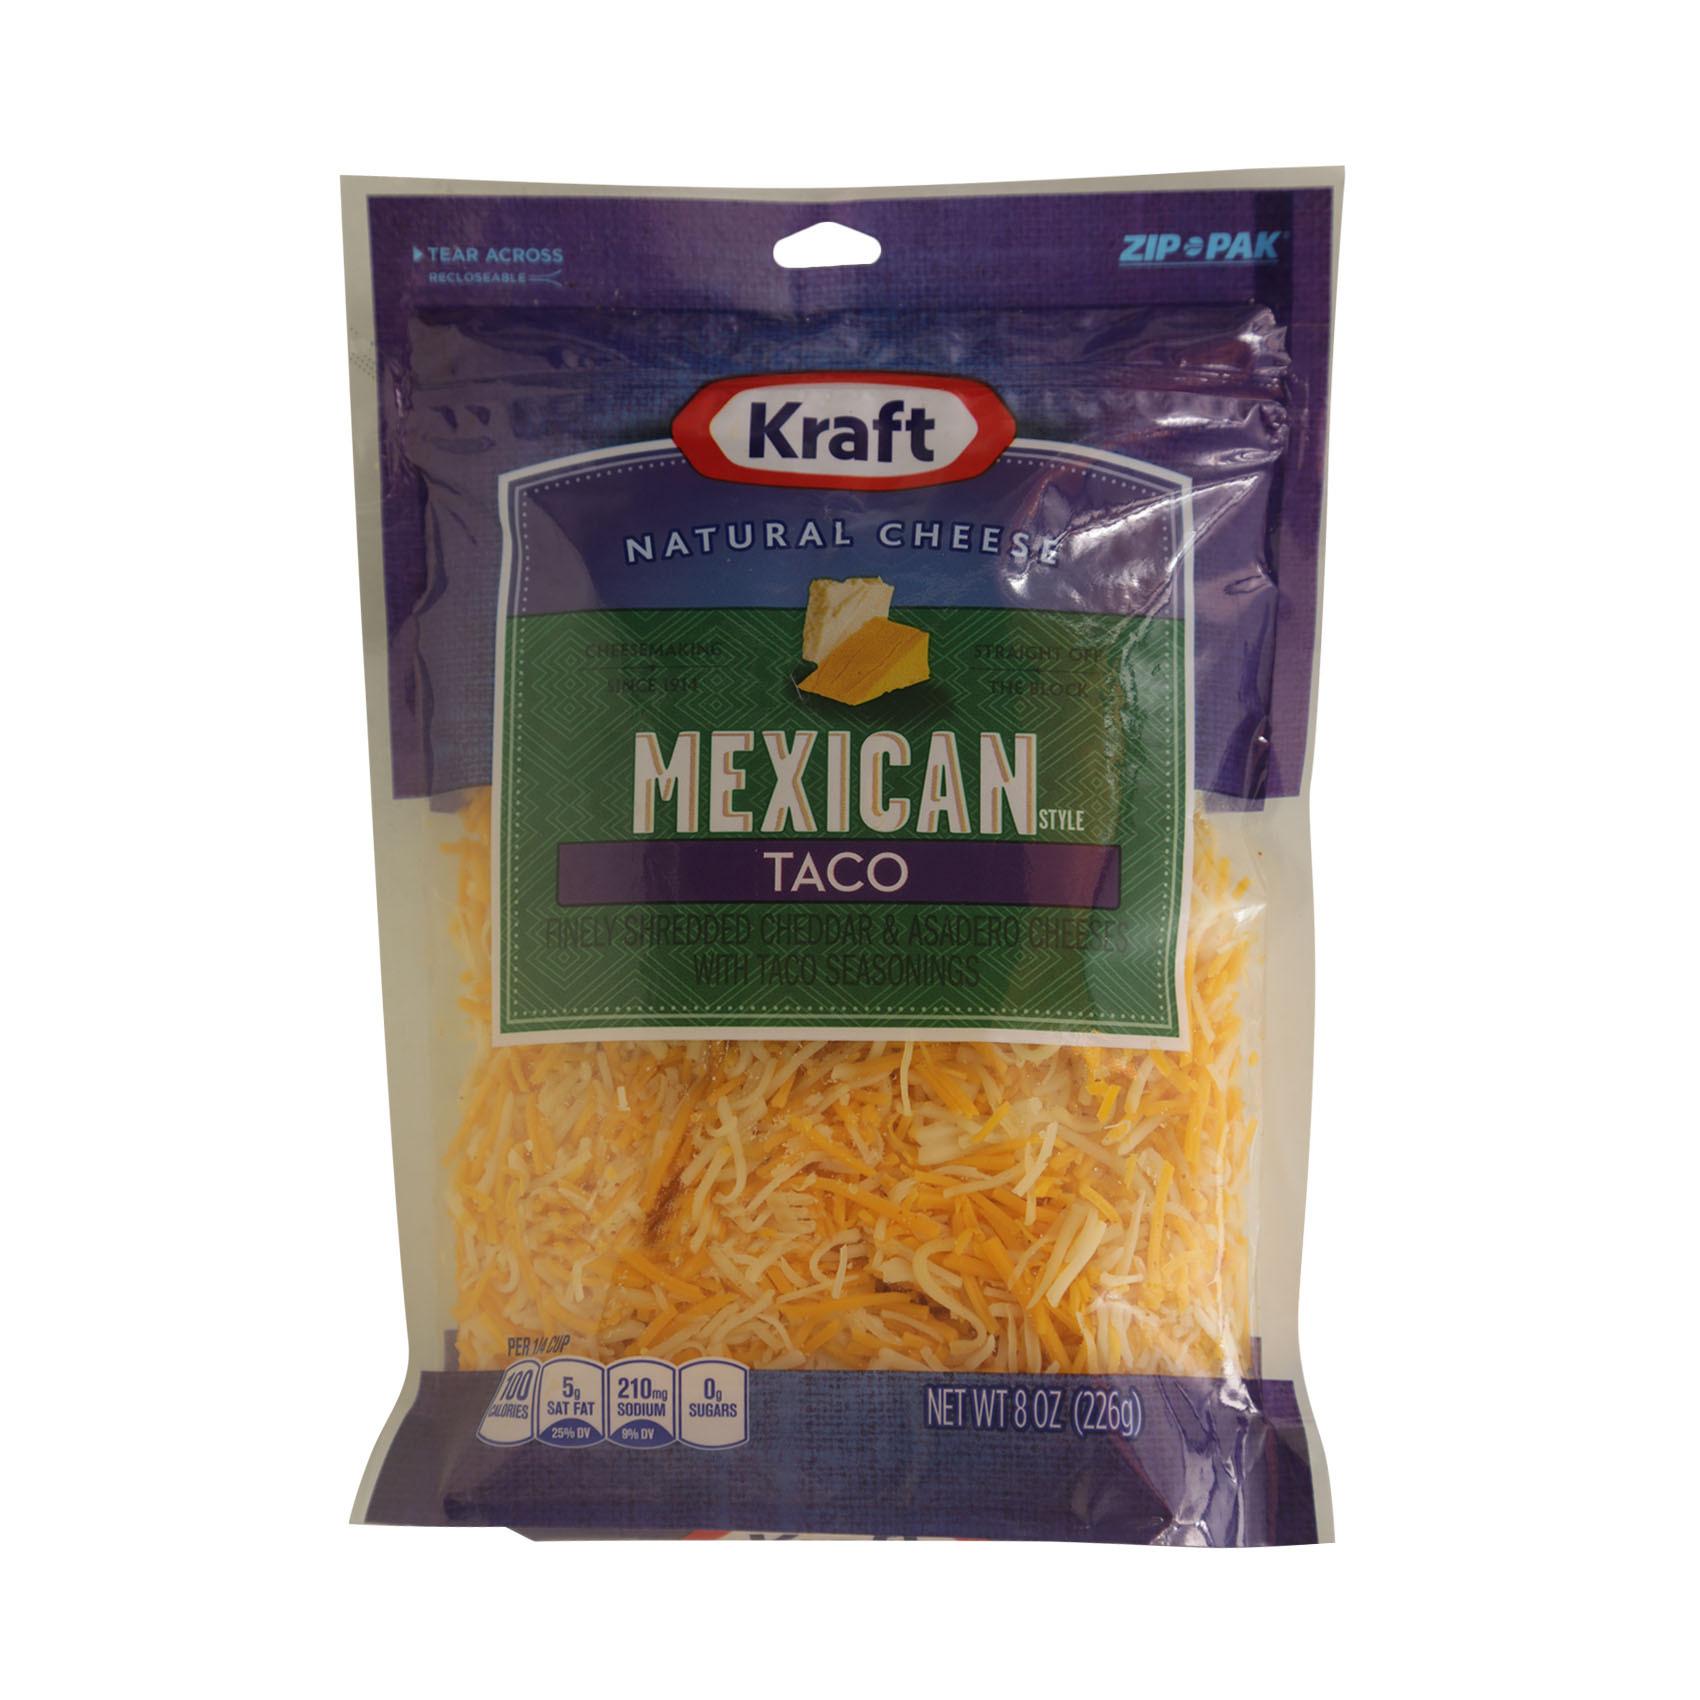 KRAFT SHREDDED MEX TACO CHEESE 226G